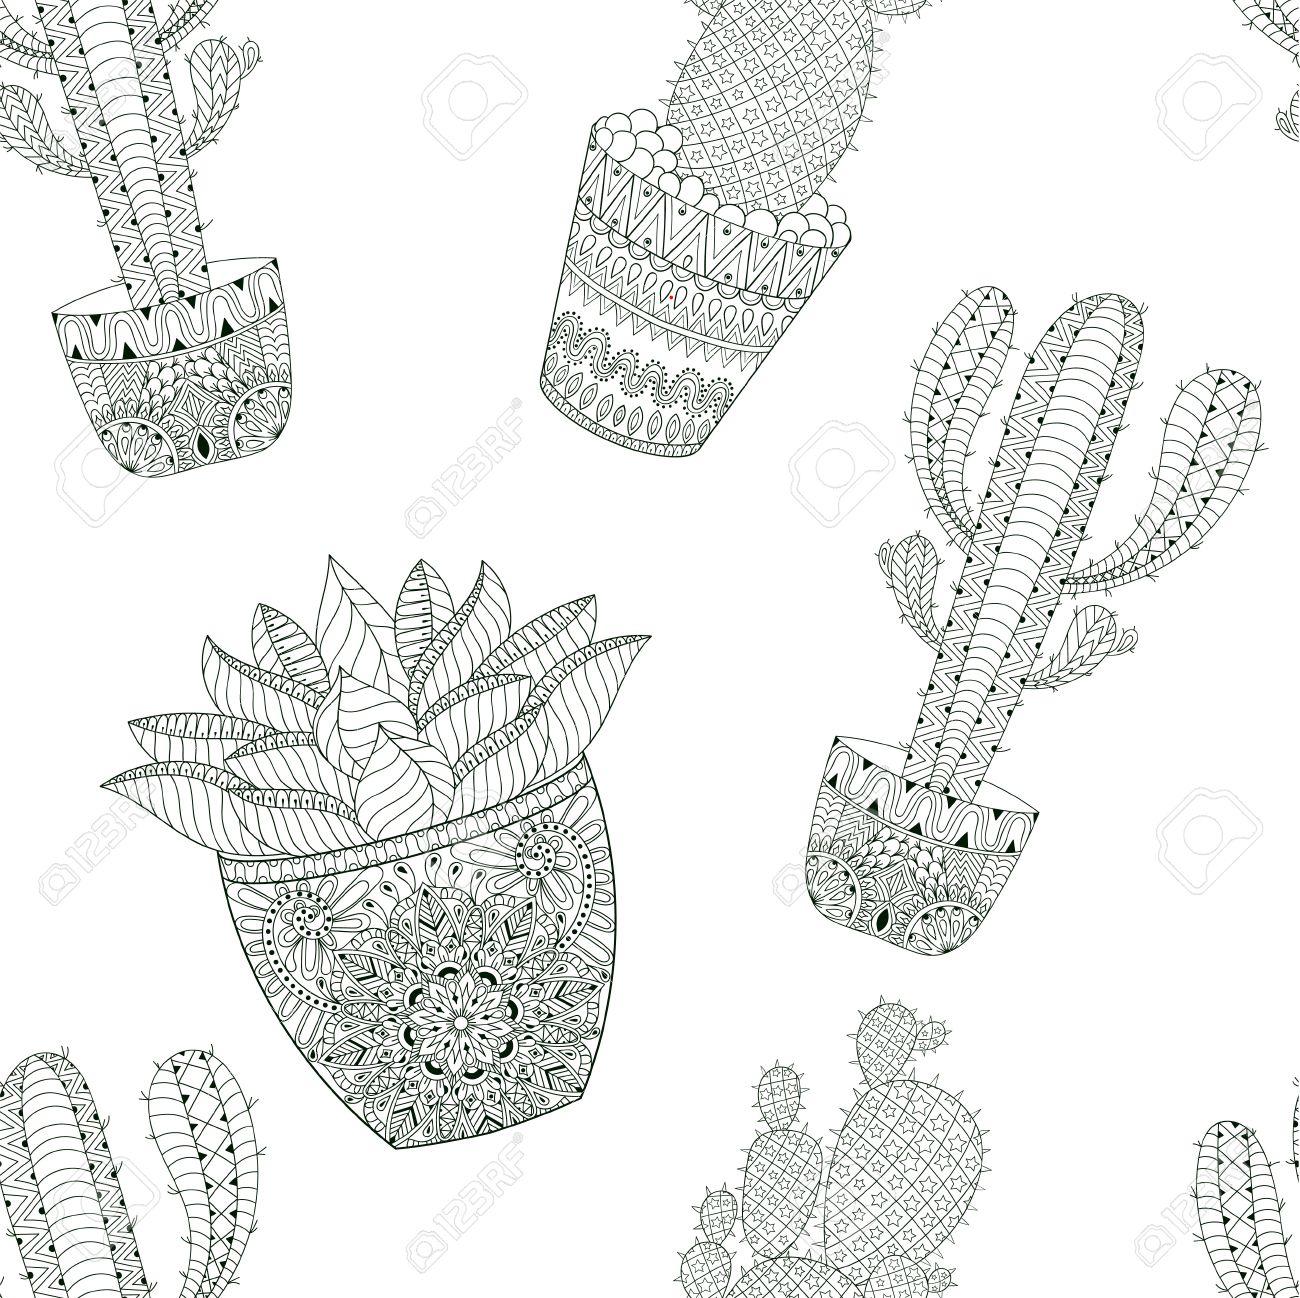 Zentangle Patrón Transparente Cactus Mexicano Ilustración Vectorial